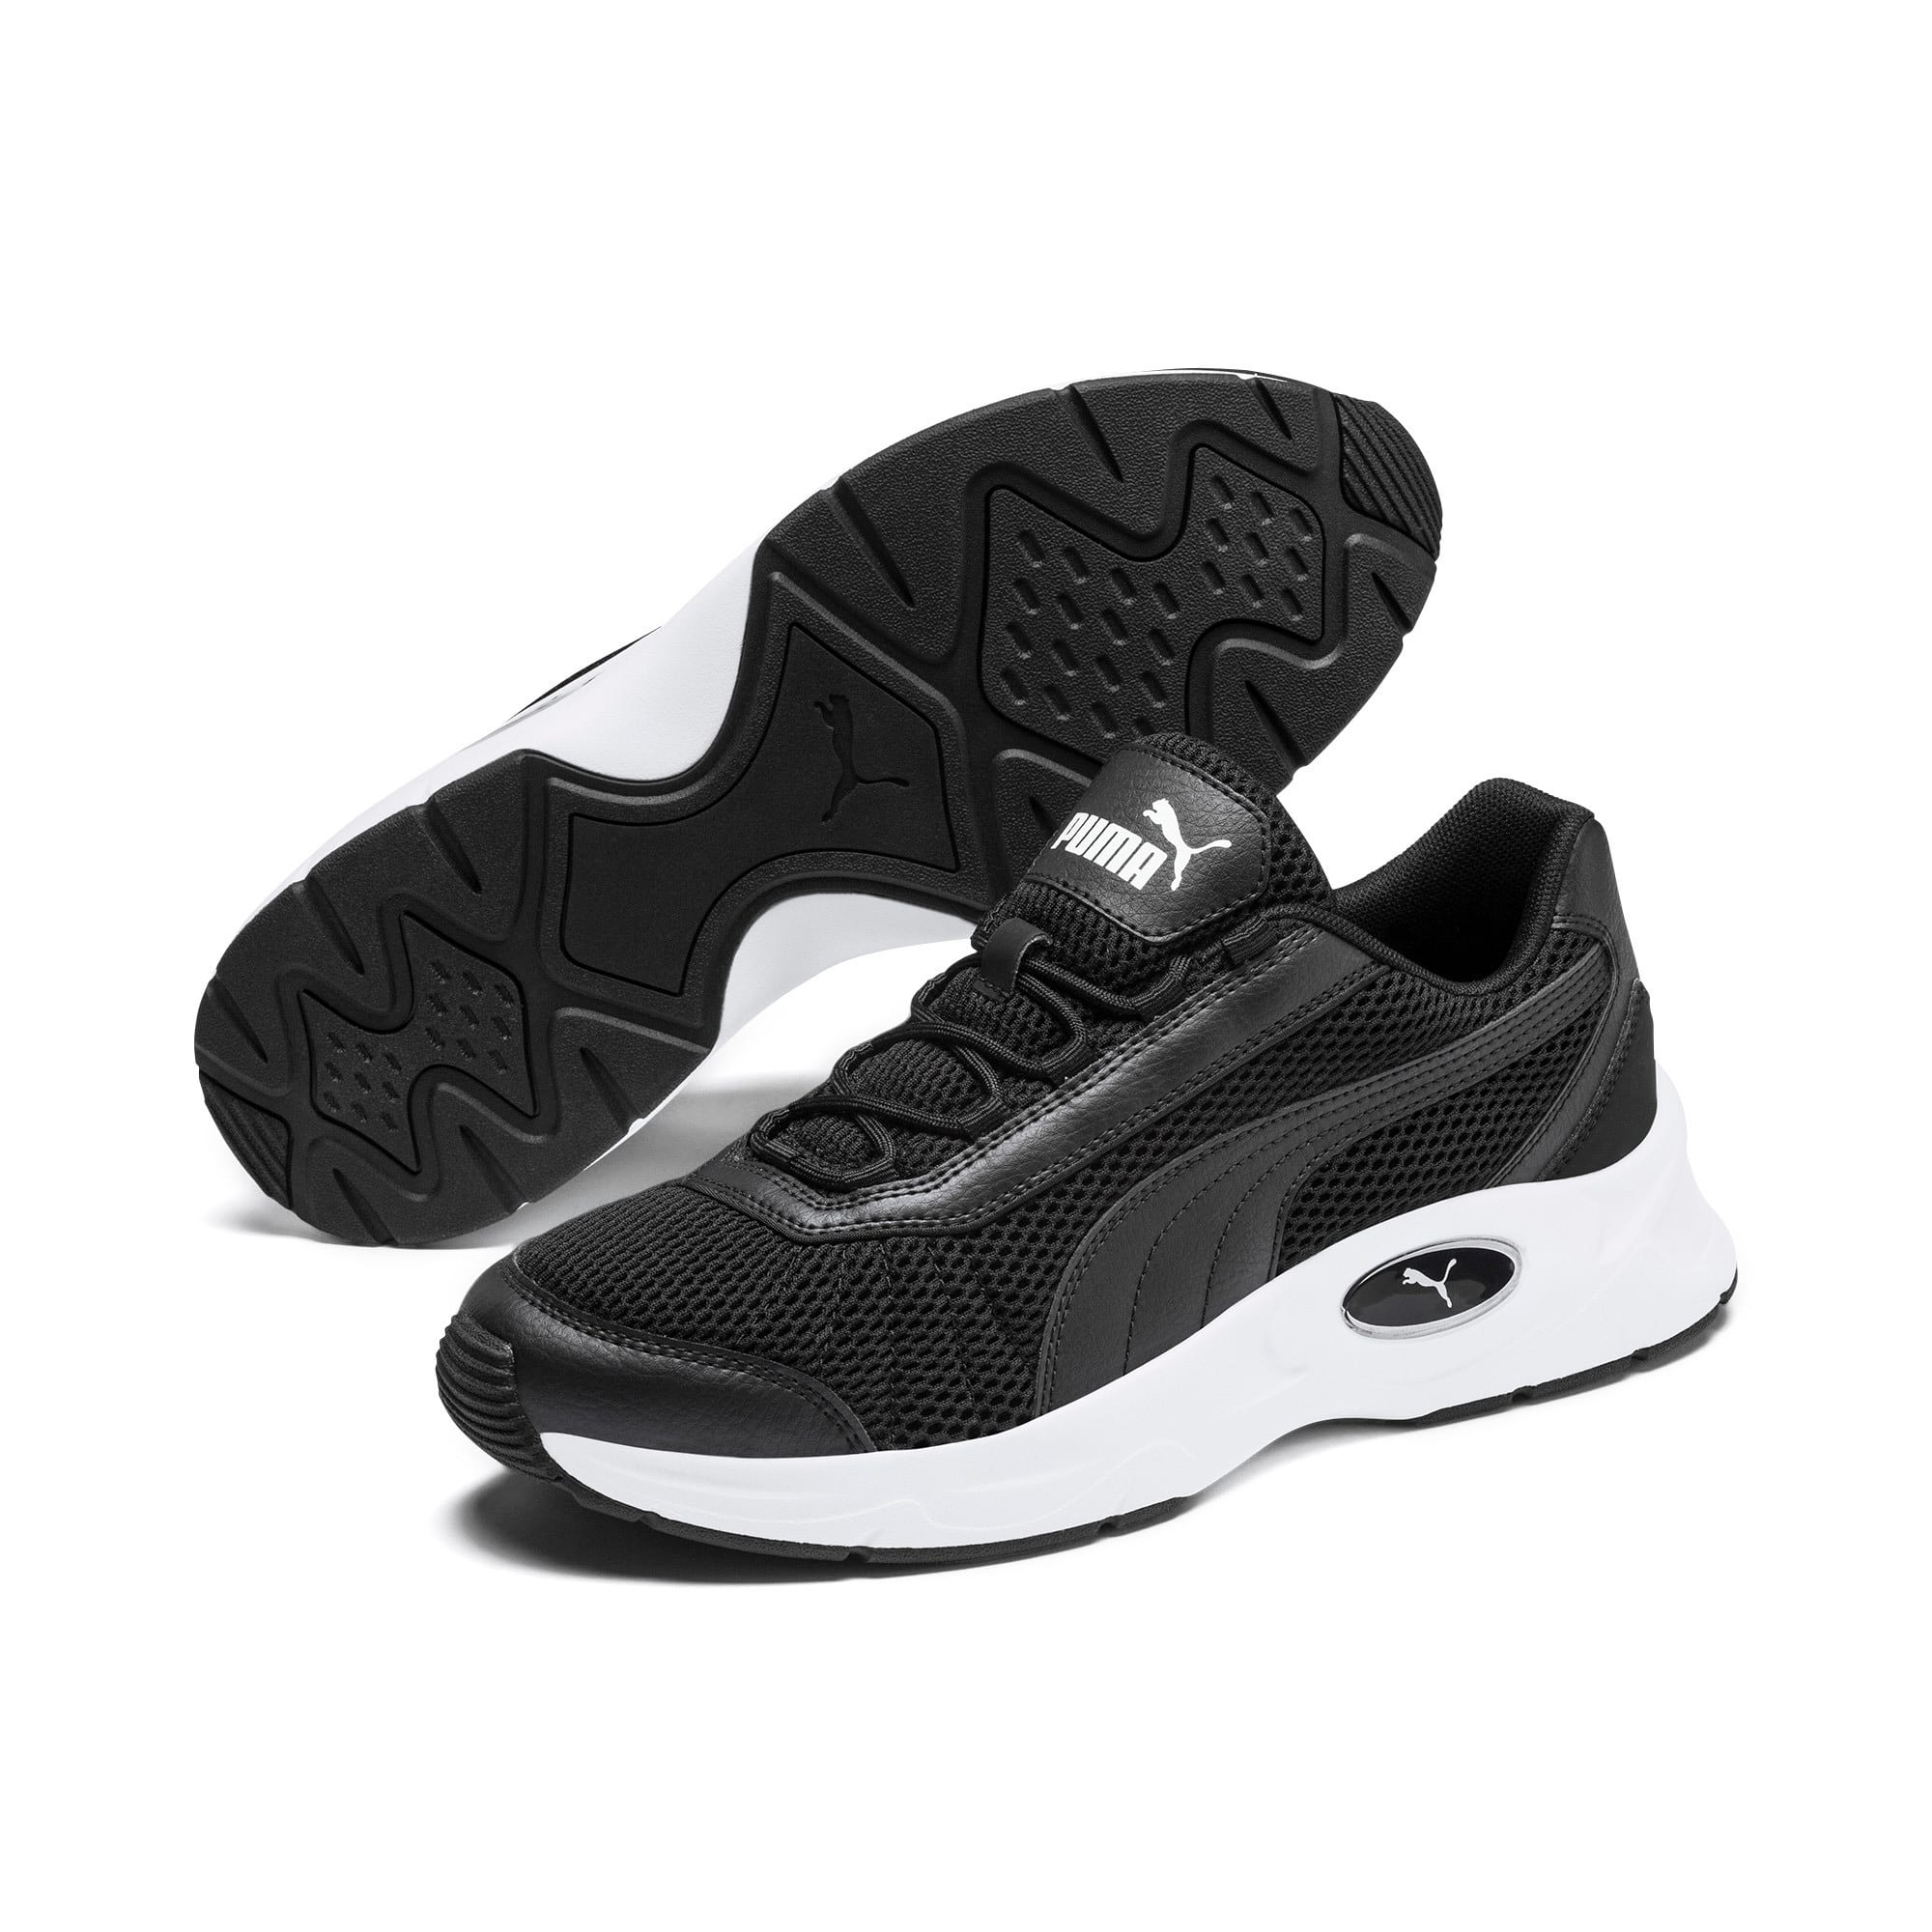 Thumbnail 3 of Nucleus Training Shoes, Puma Black-Puma Black, medium